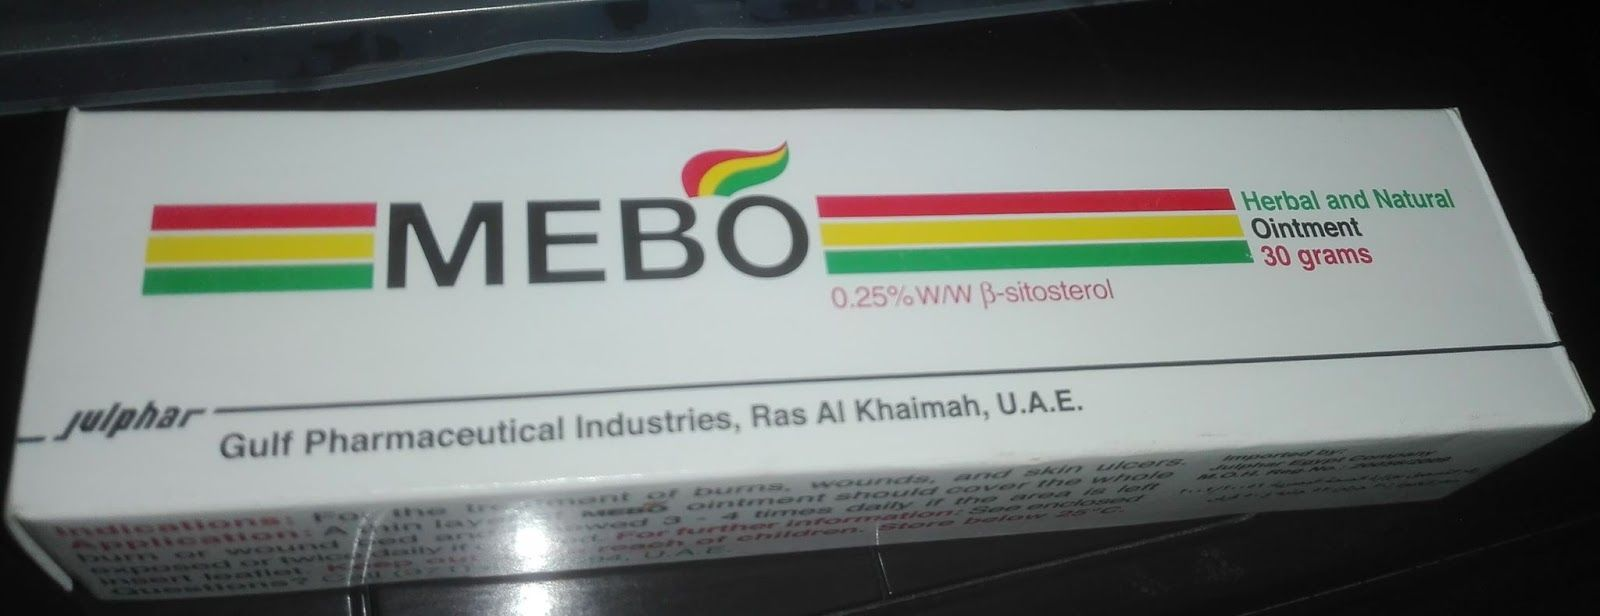 مرهم ميبو Mebo للحروق والجروح Ointment Herbalism Pharmaceutical